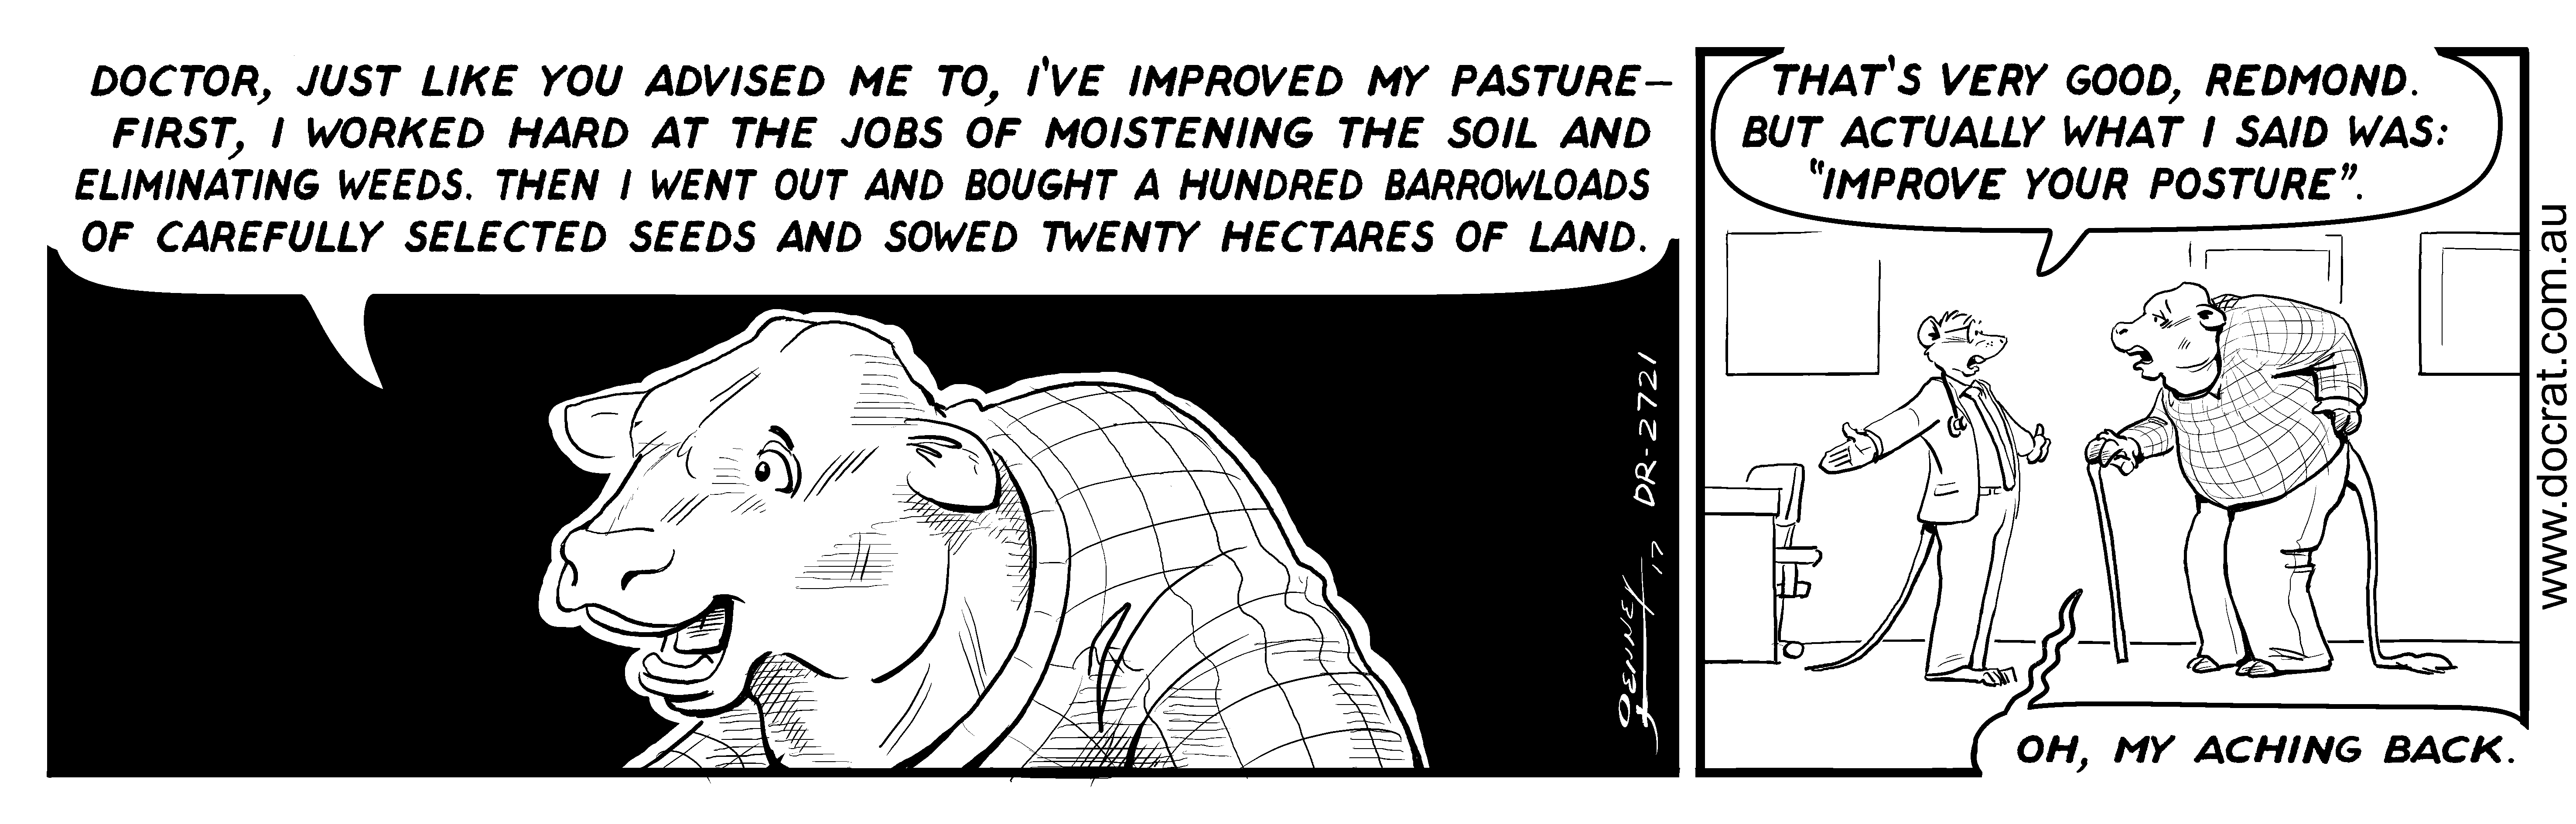 20170227